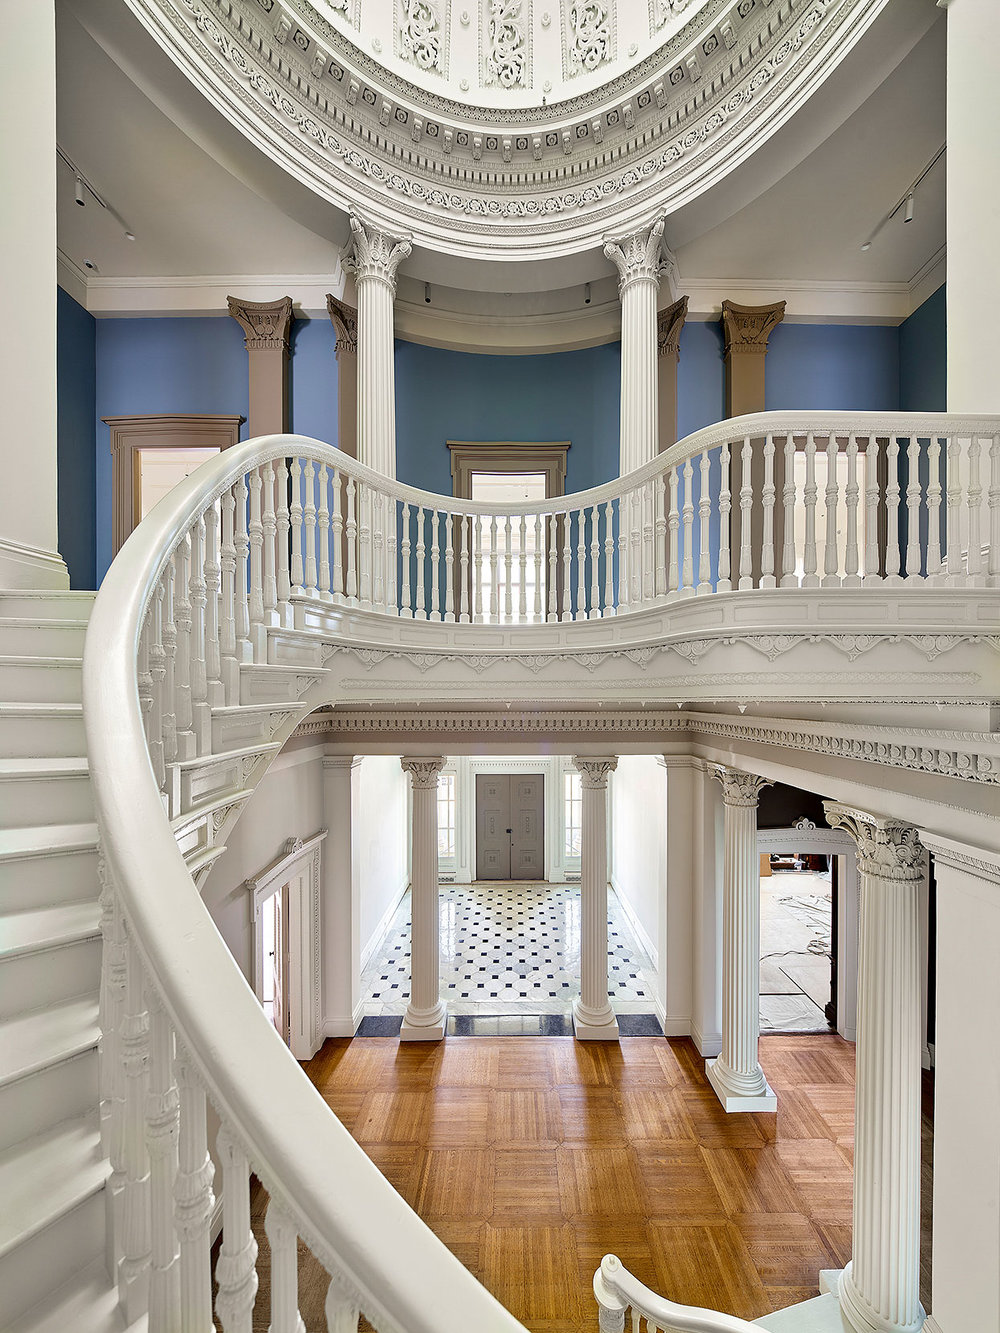 Walters Art Museum Baltimore, MD